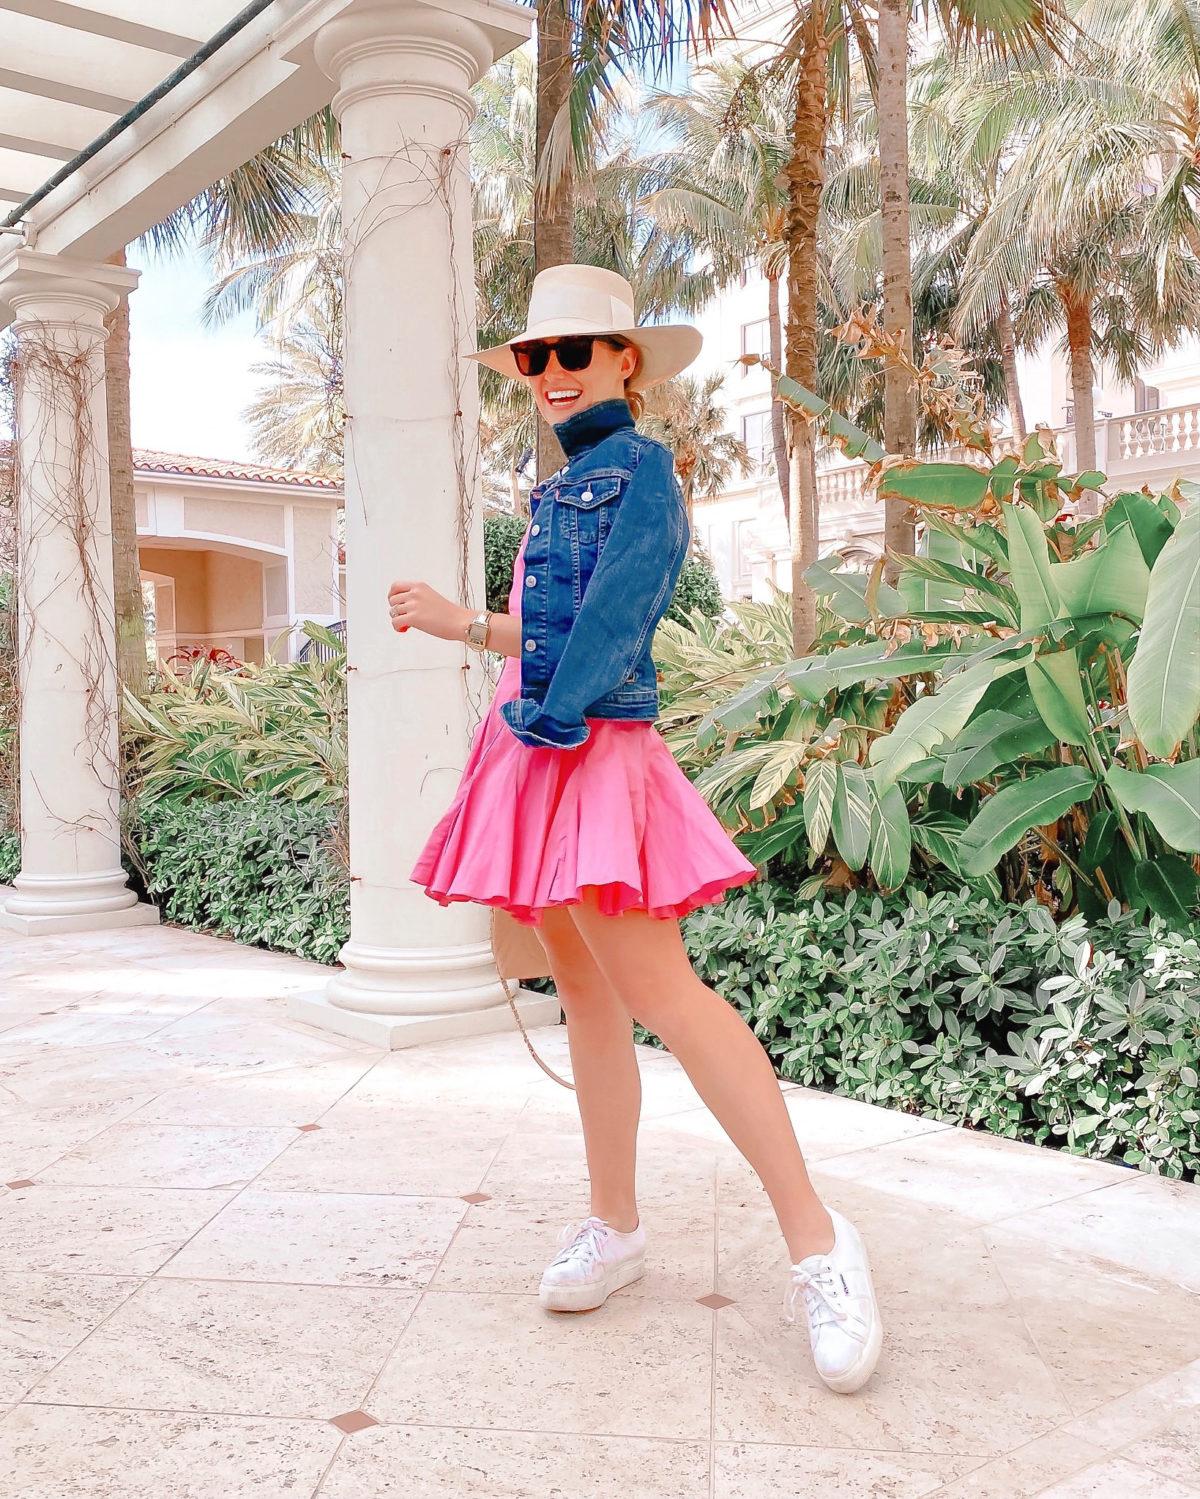 tuckernuck online sample sale, rhode resort wrap dress, artesano ibiza wide brim hat, superga platform sneakers